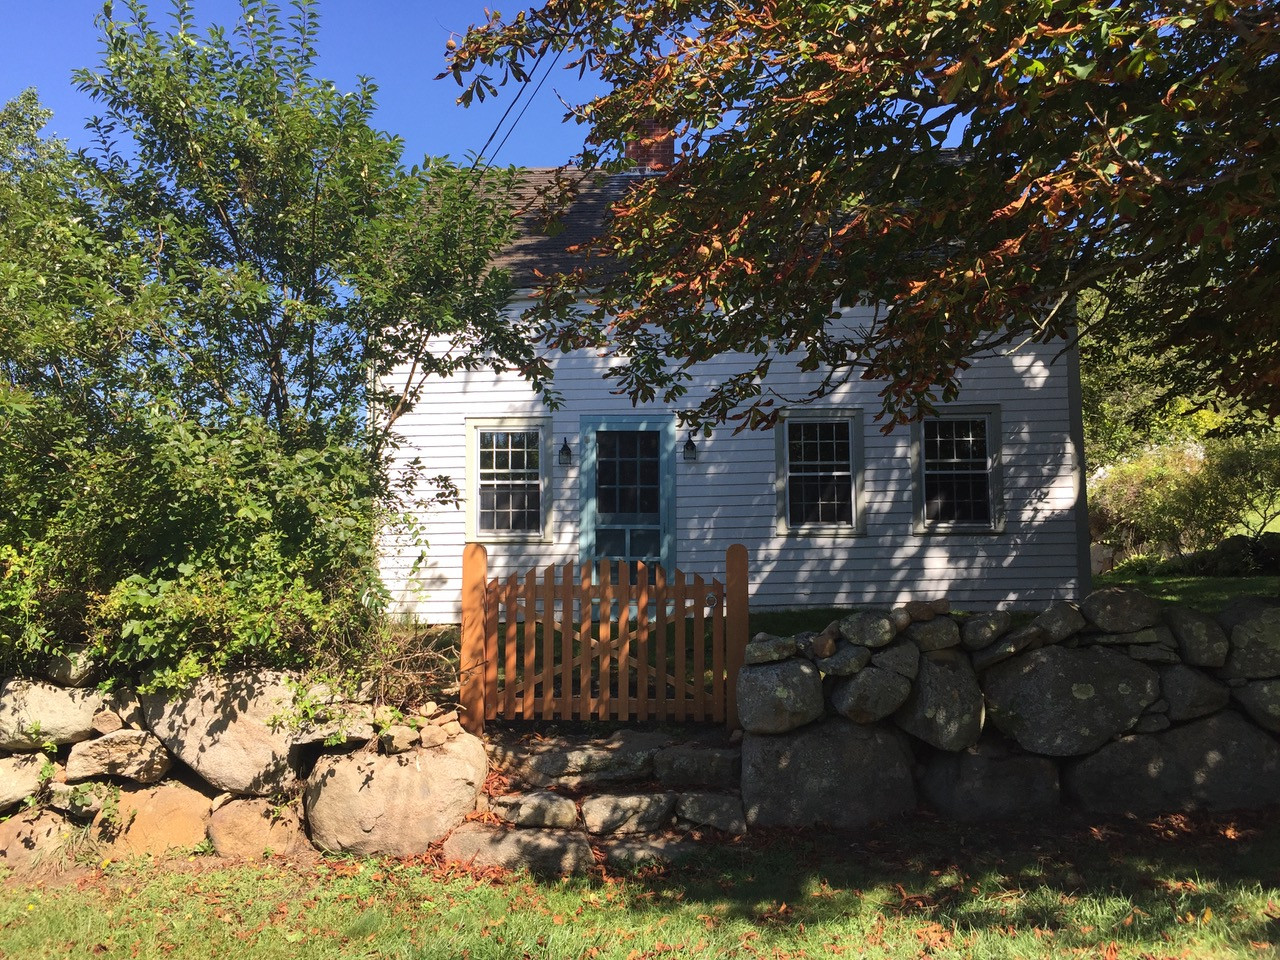 Swihart Residence